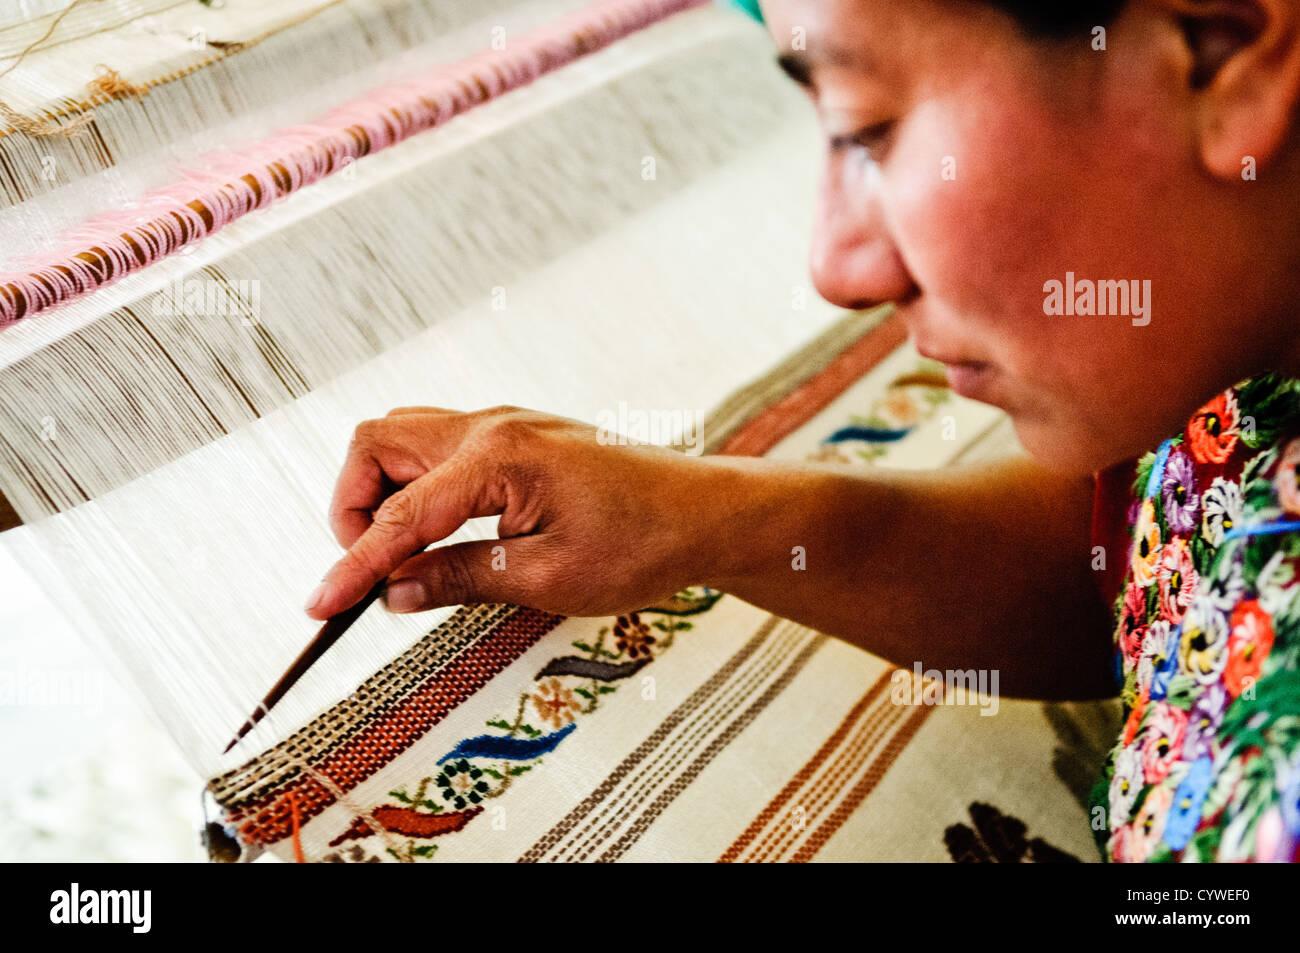 at Casa del Tejido Antiguo, an indigenous textile museum and market in Antigua, Guatemala - Stock Image